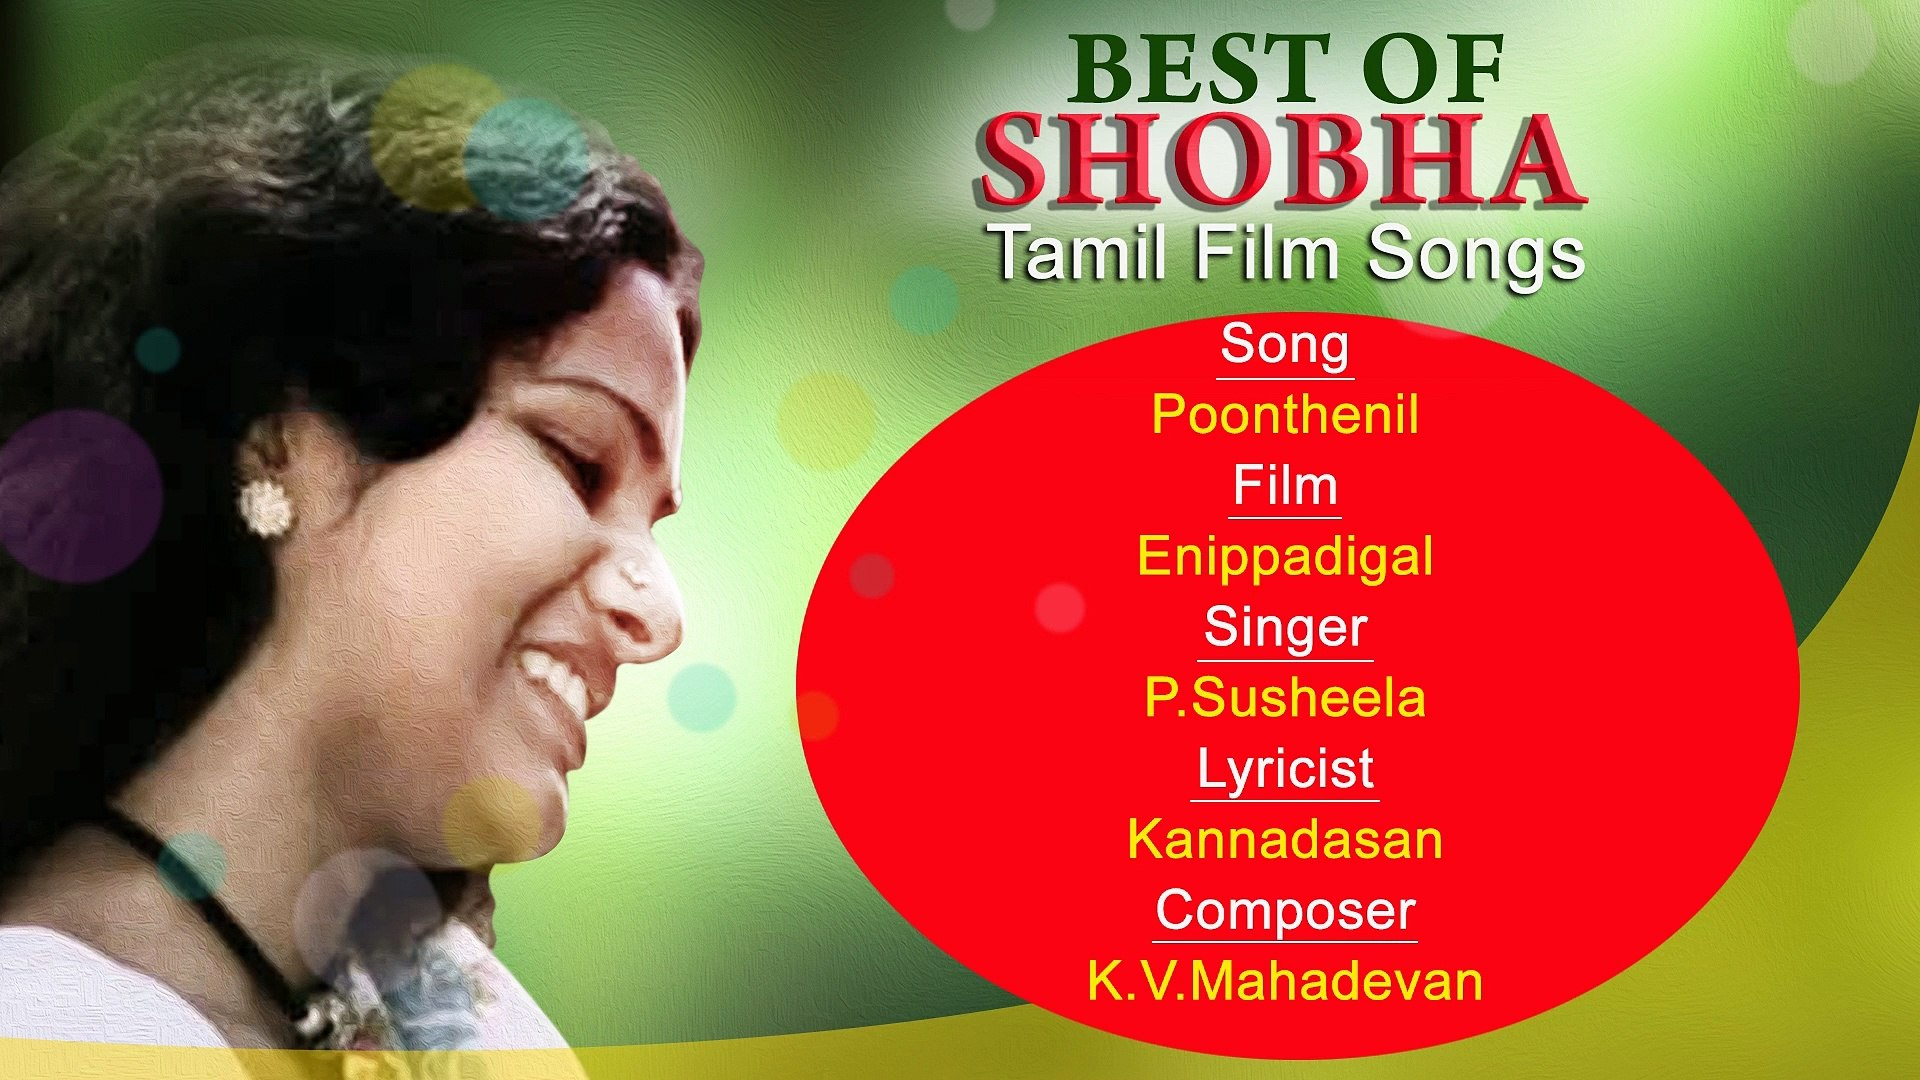 Poonthenil Best Of Shobha Tamil Film Actress Hit Tamil Film Songs K J Yesudas S Janaki